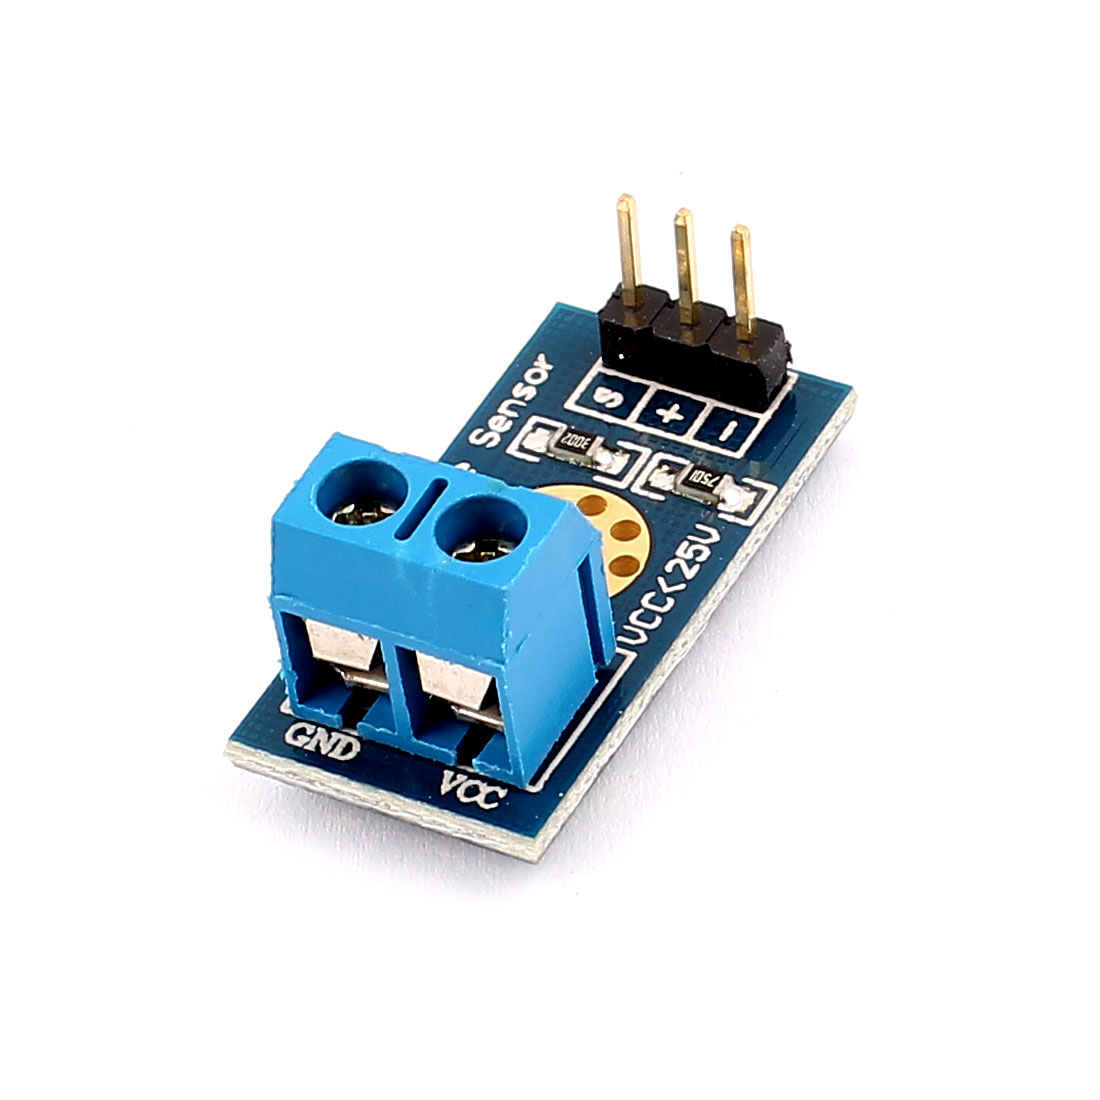 Max 25V Voltage Detector Range 3 Terminal Sensor Module for Arduino